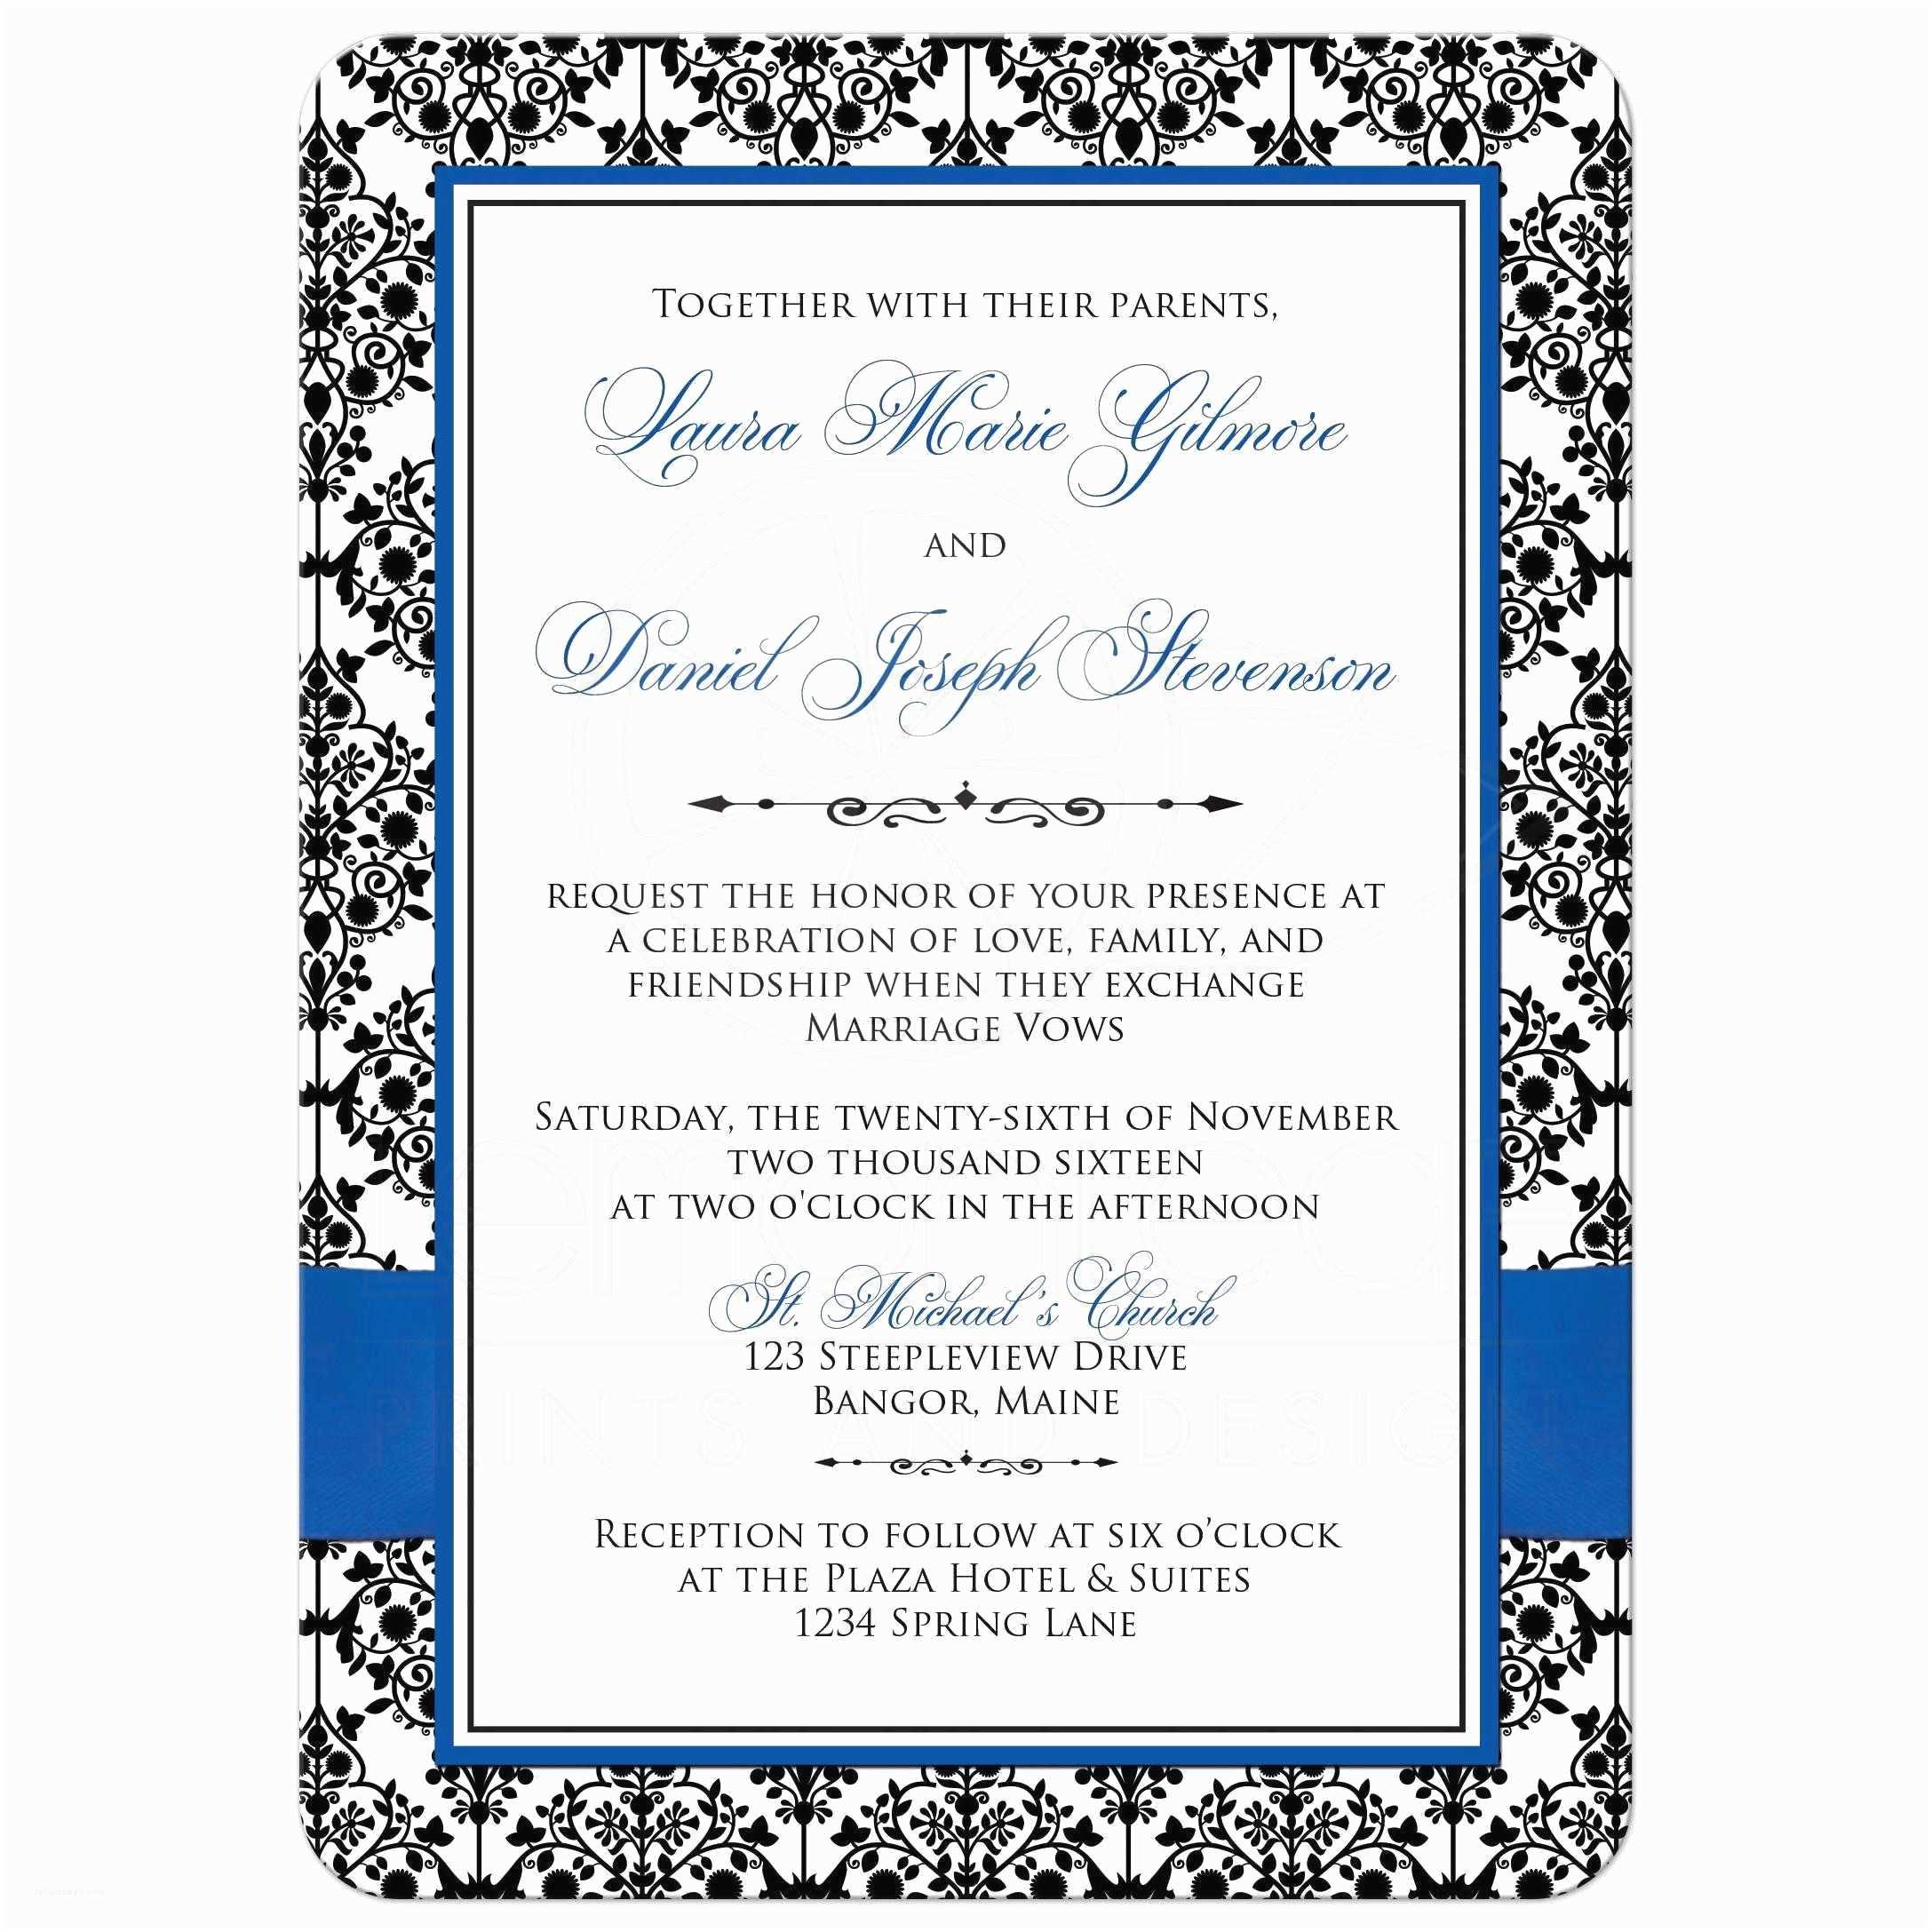 Royal Blue and Black Wedding Invitations Photo Template Wedding Invite